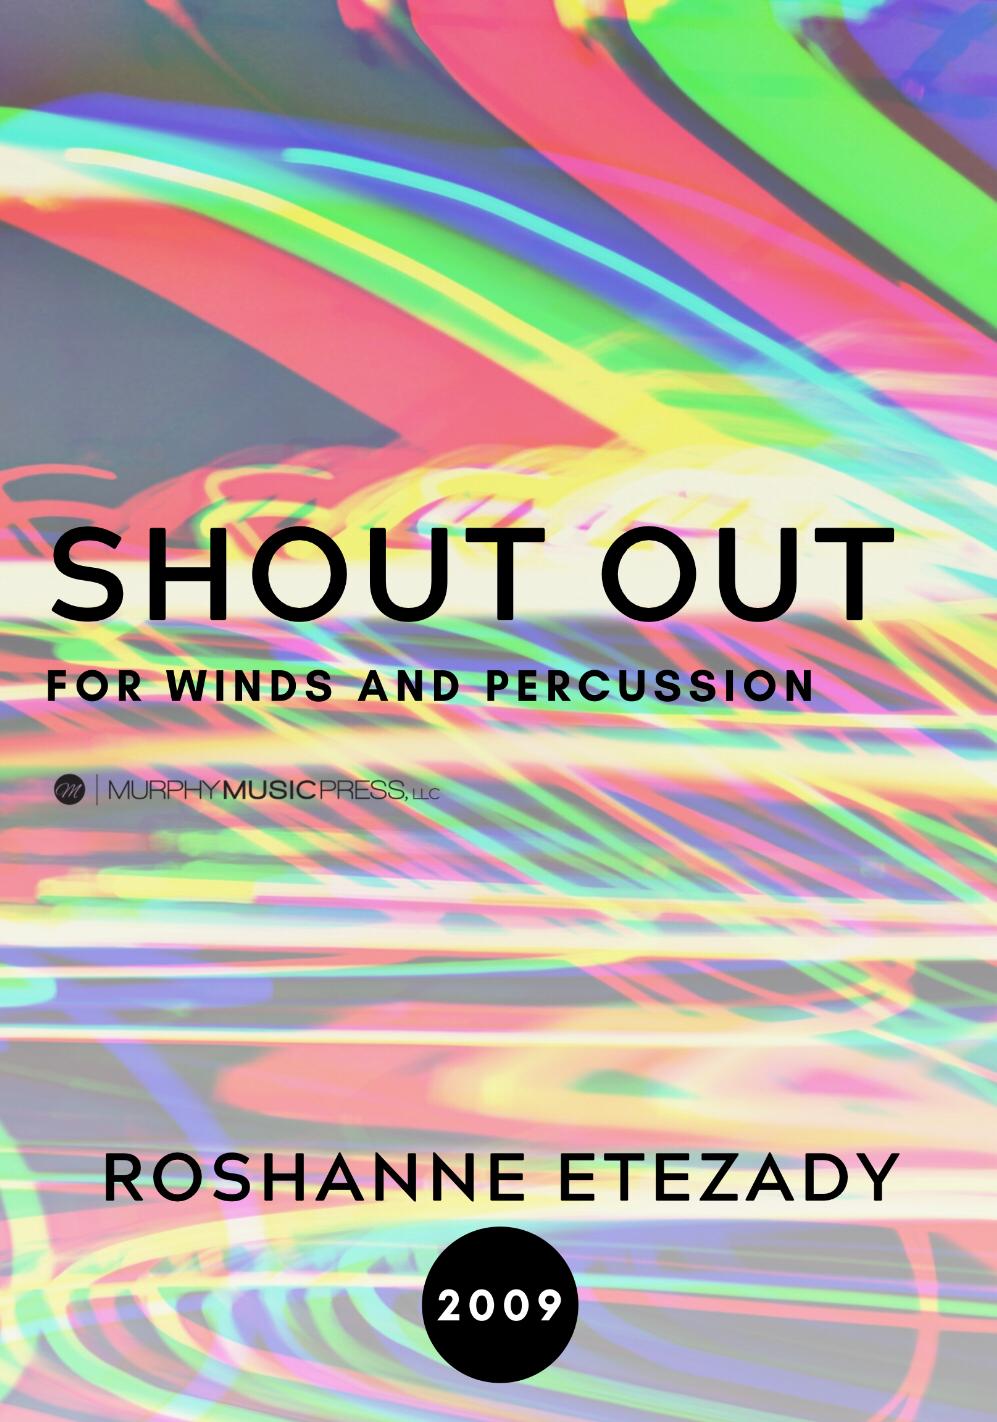 Shoutout by Roshanne Etezady